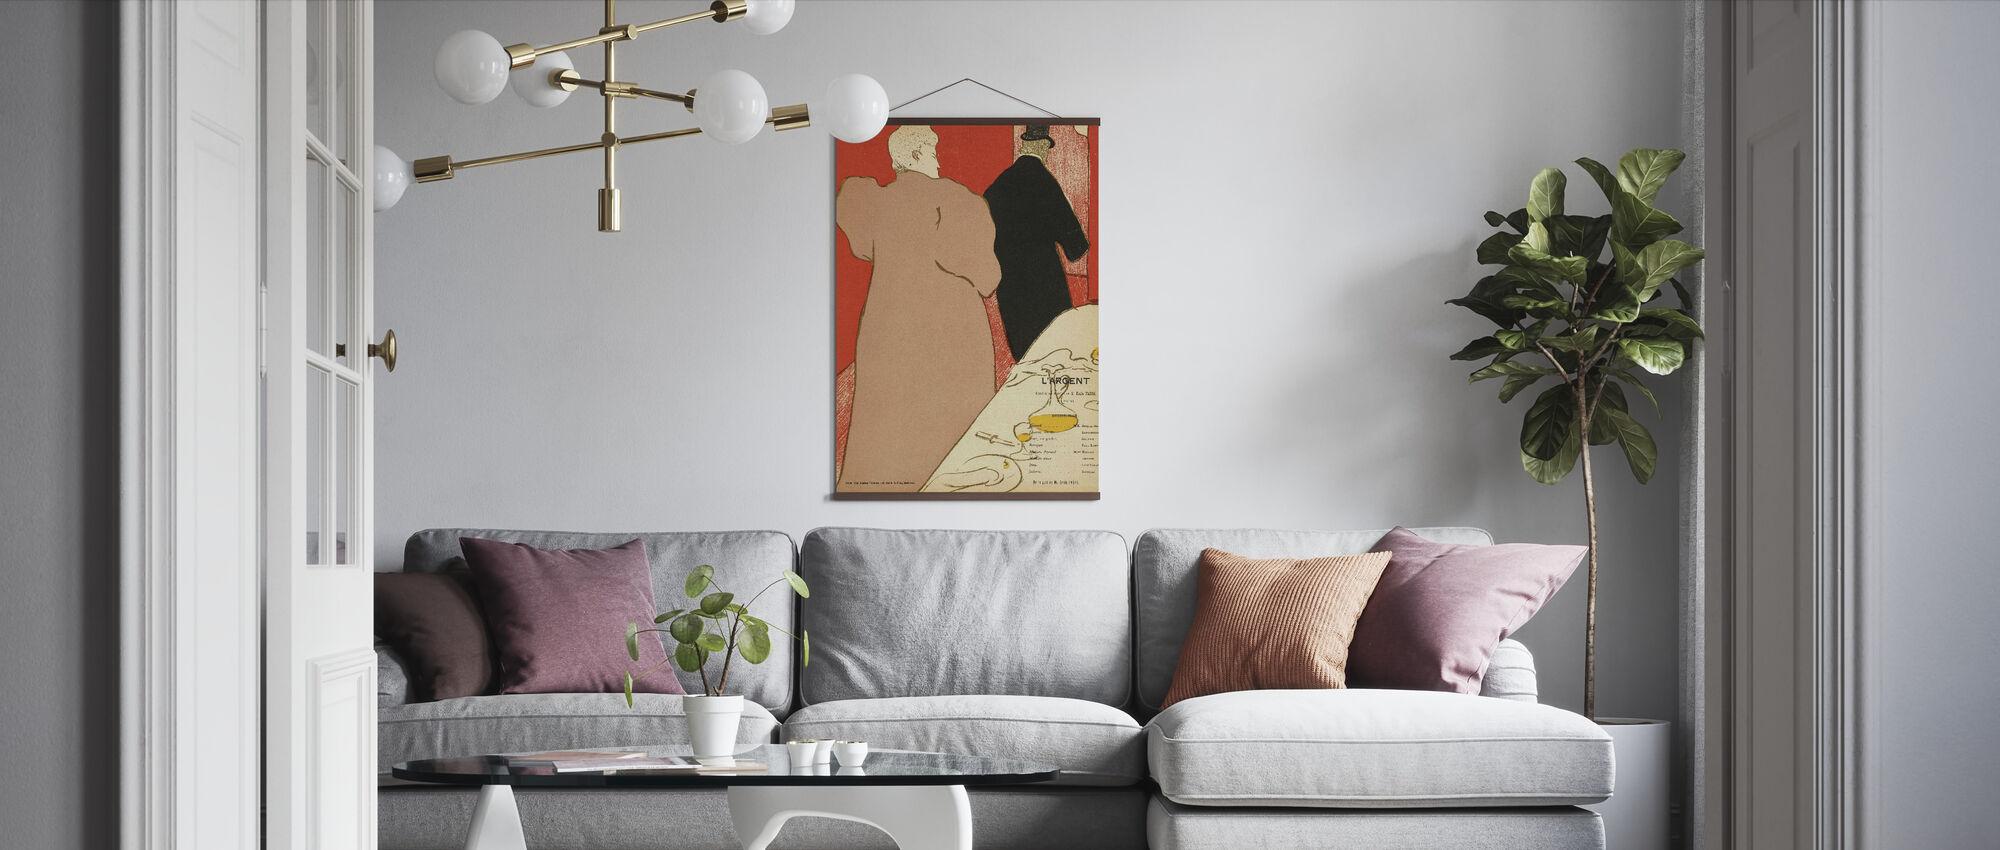 Silver - Emile Fabre - Poster - Vardagsrum